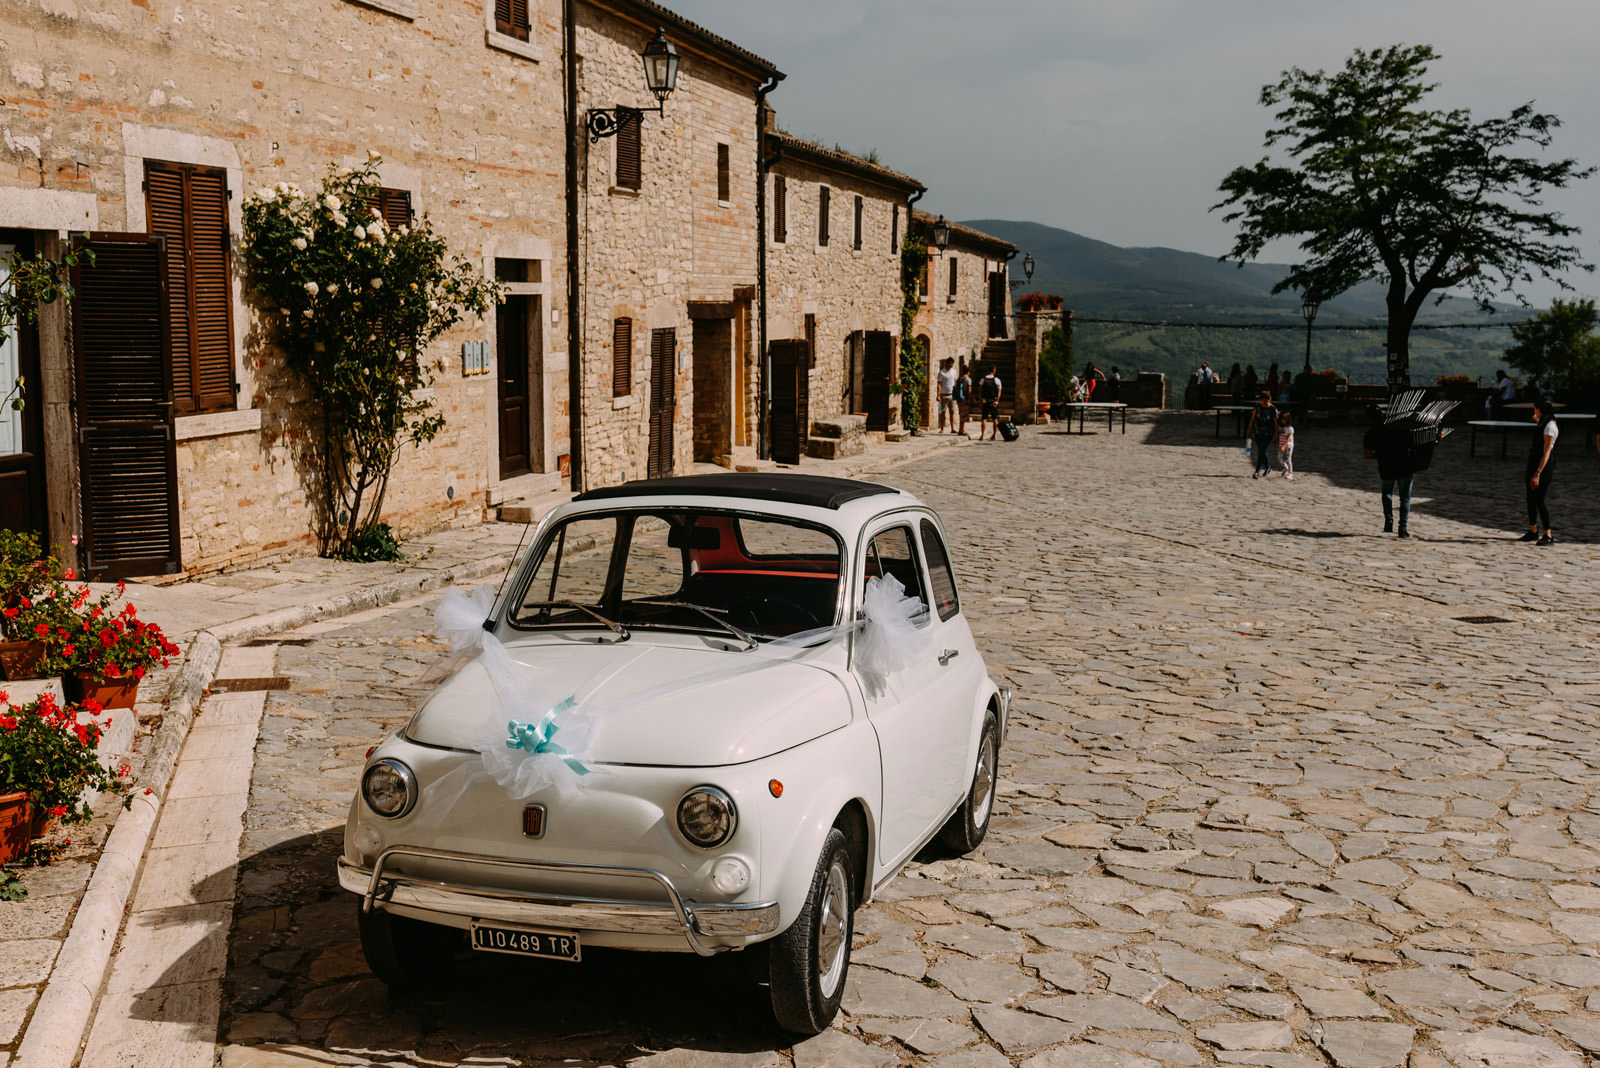 slub za granica- wloskie wesele i widok z Castello di Titignano - Luke Sezeck